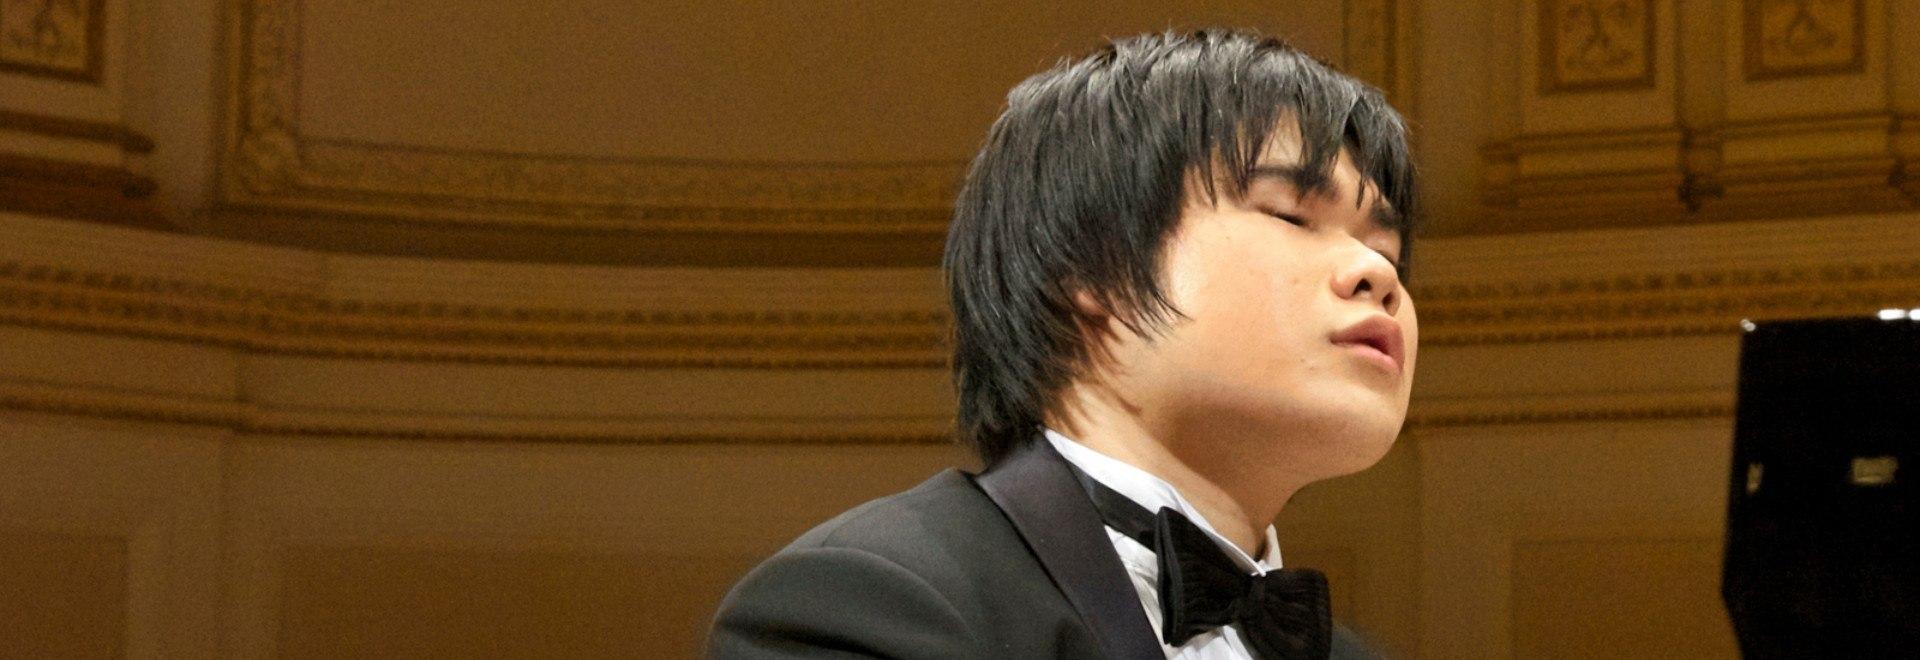 Beethoven - Sonata in re min. op.31 n.2 'La tempesta'